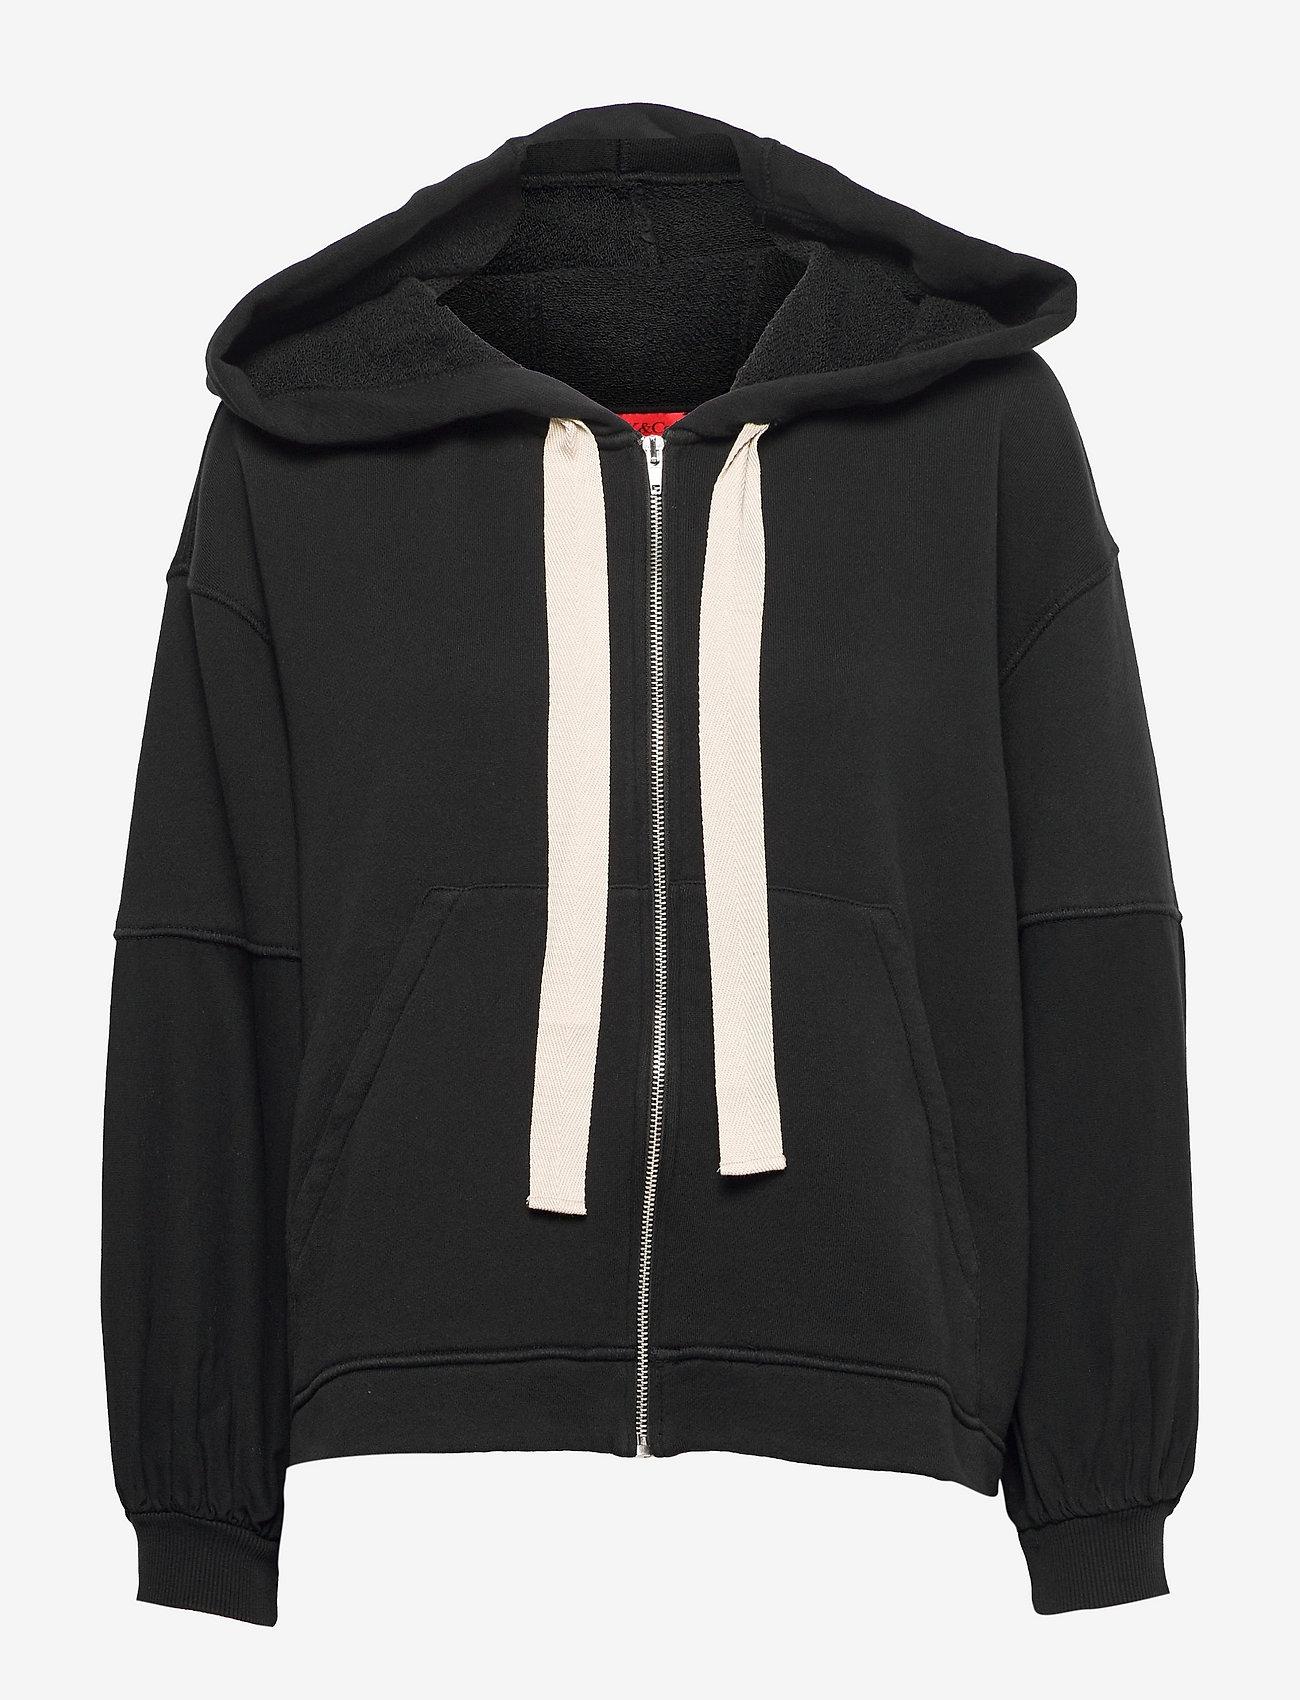 Max&Co. - CIRCE - hoodies - black - 0